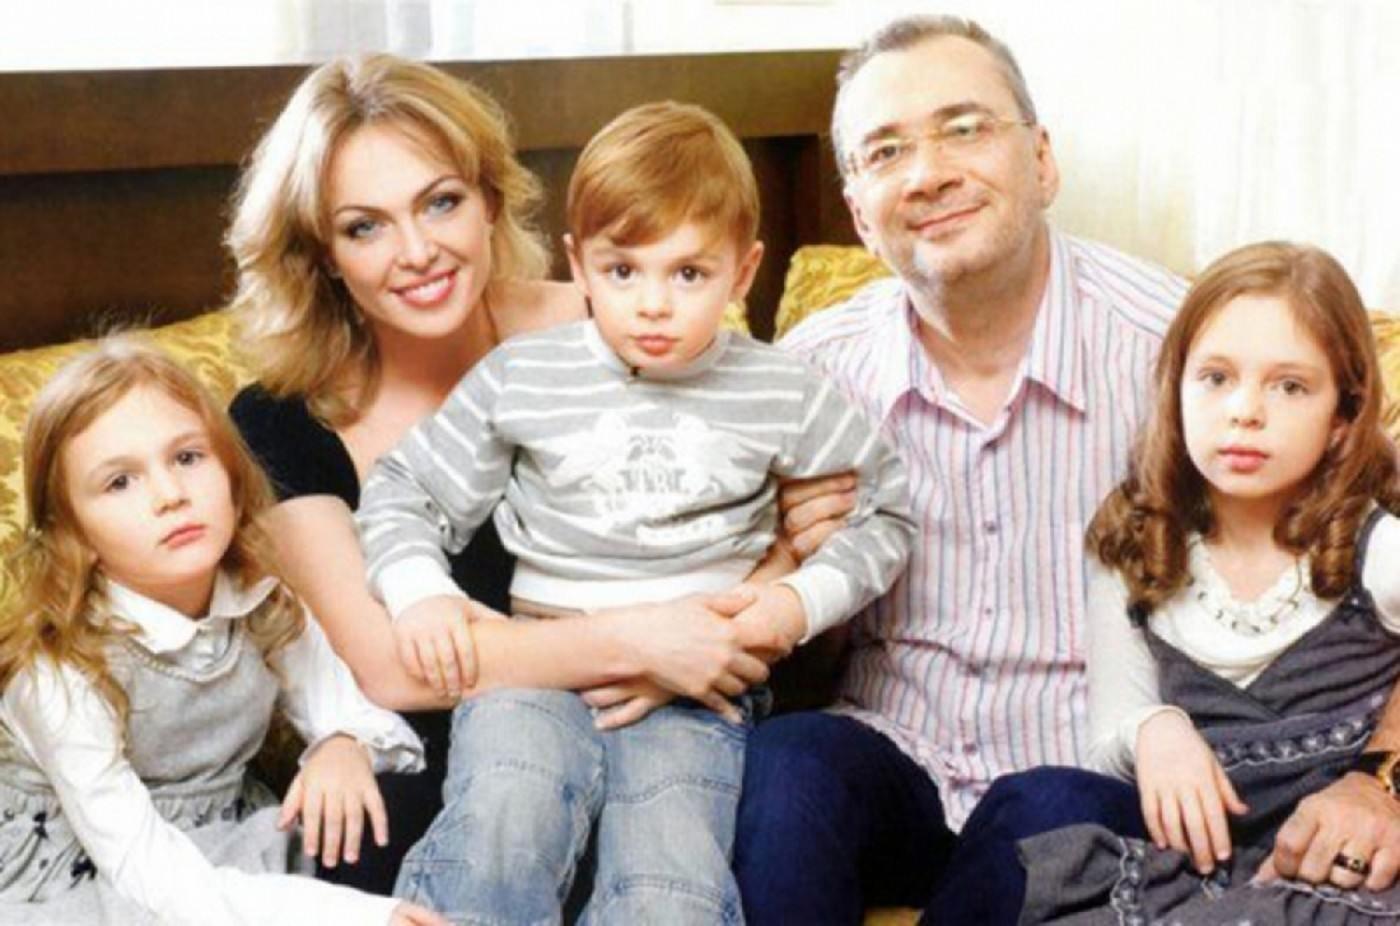 Константин Меладзе поздравил дочь с 17-летием